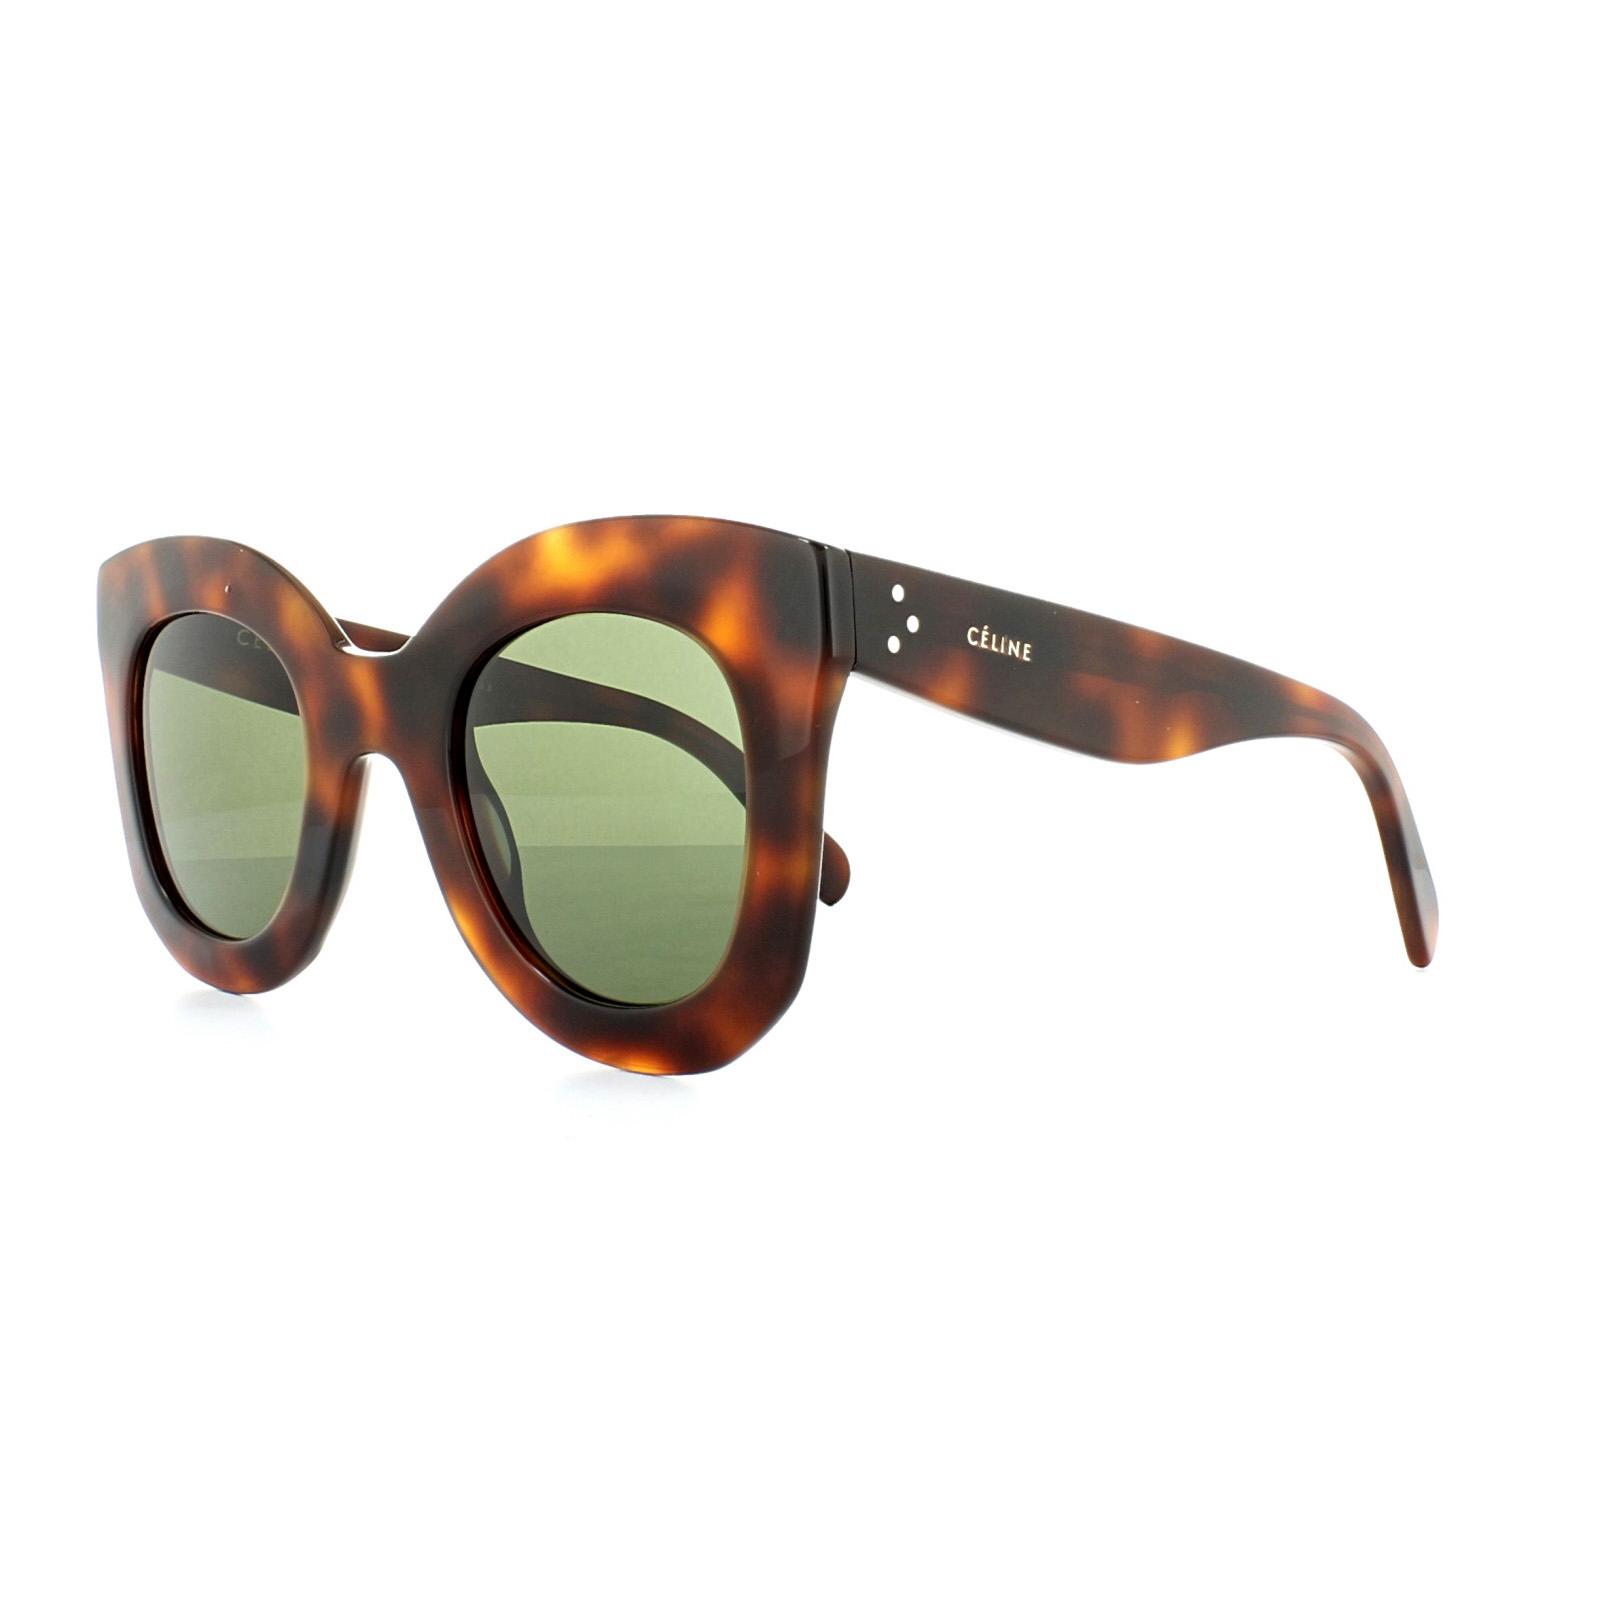 b89ca8f5949 Cheap Celine 41093 S Marta Sunglasses - Discounted Sunglasses